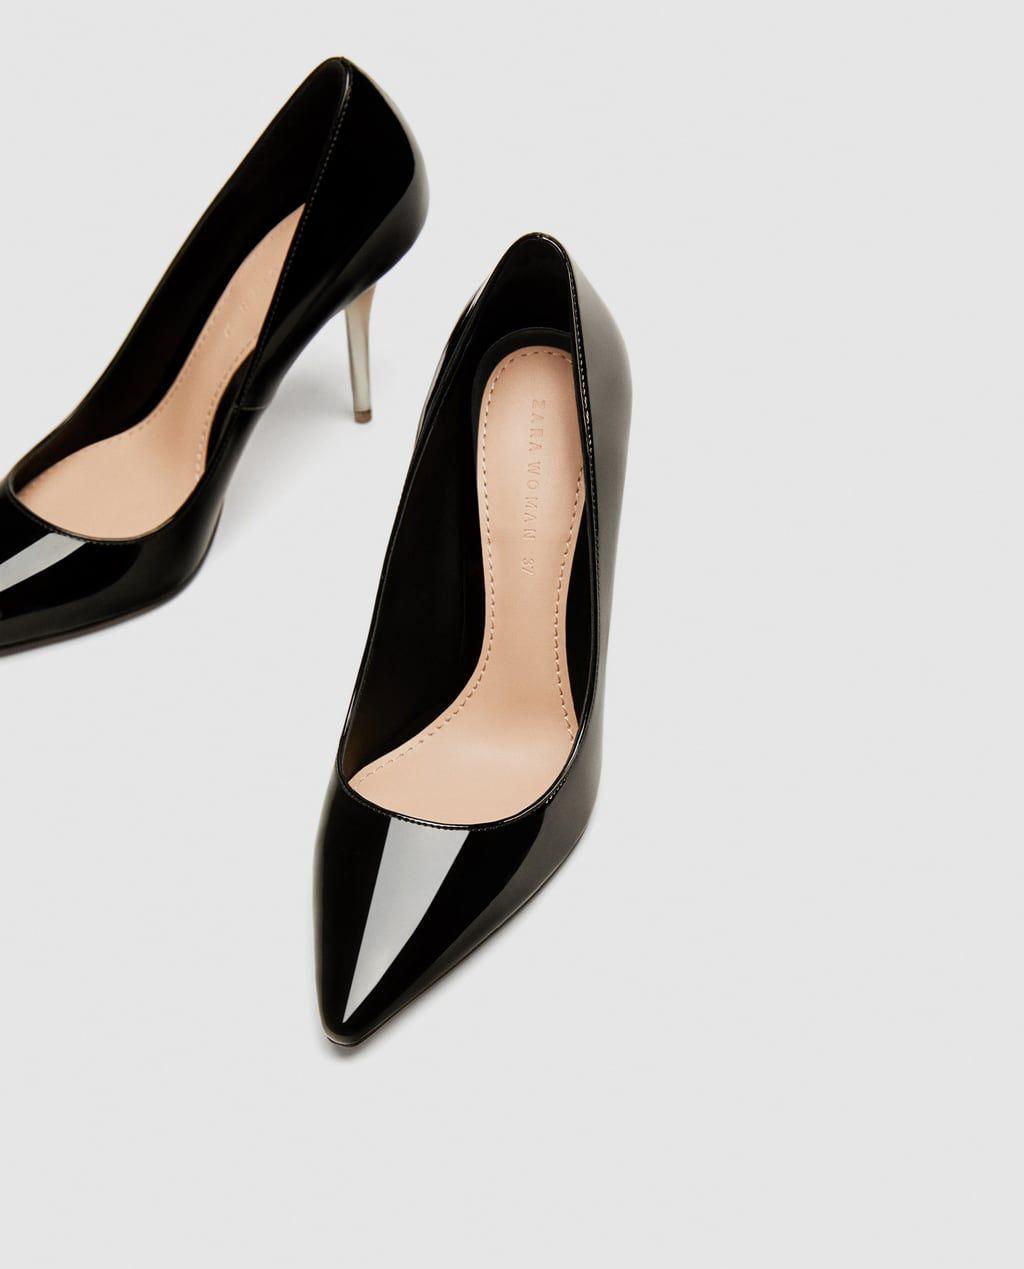 539610011 ZARA - WOMAN - HIGH HEEL COURT SHOES WITH METHACRYLATE HEELS Sapatos,  Pumps, Saltos